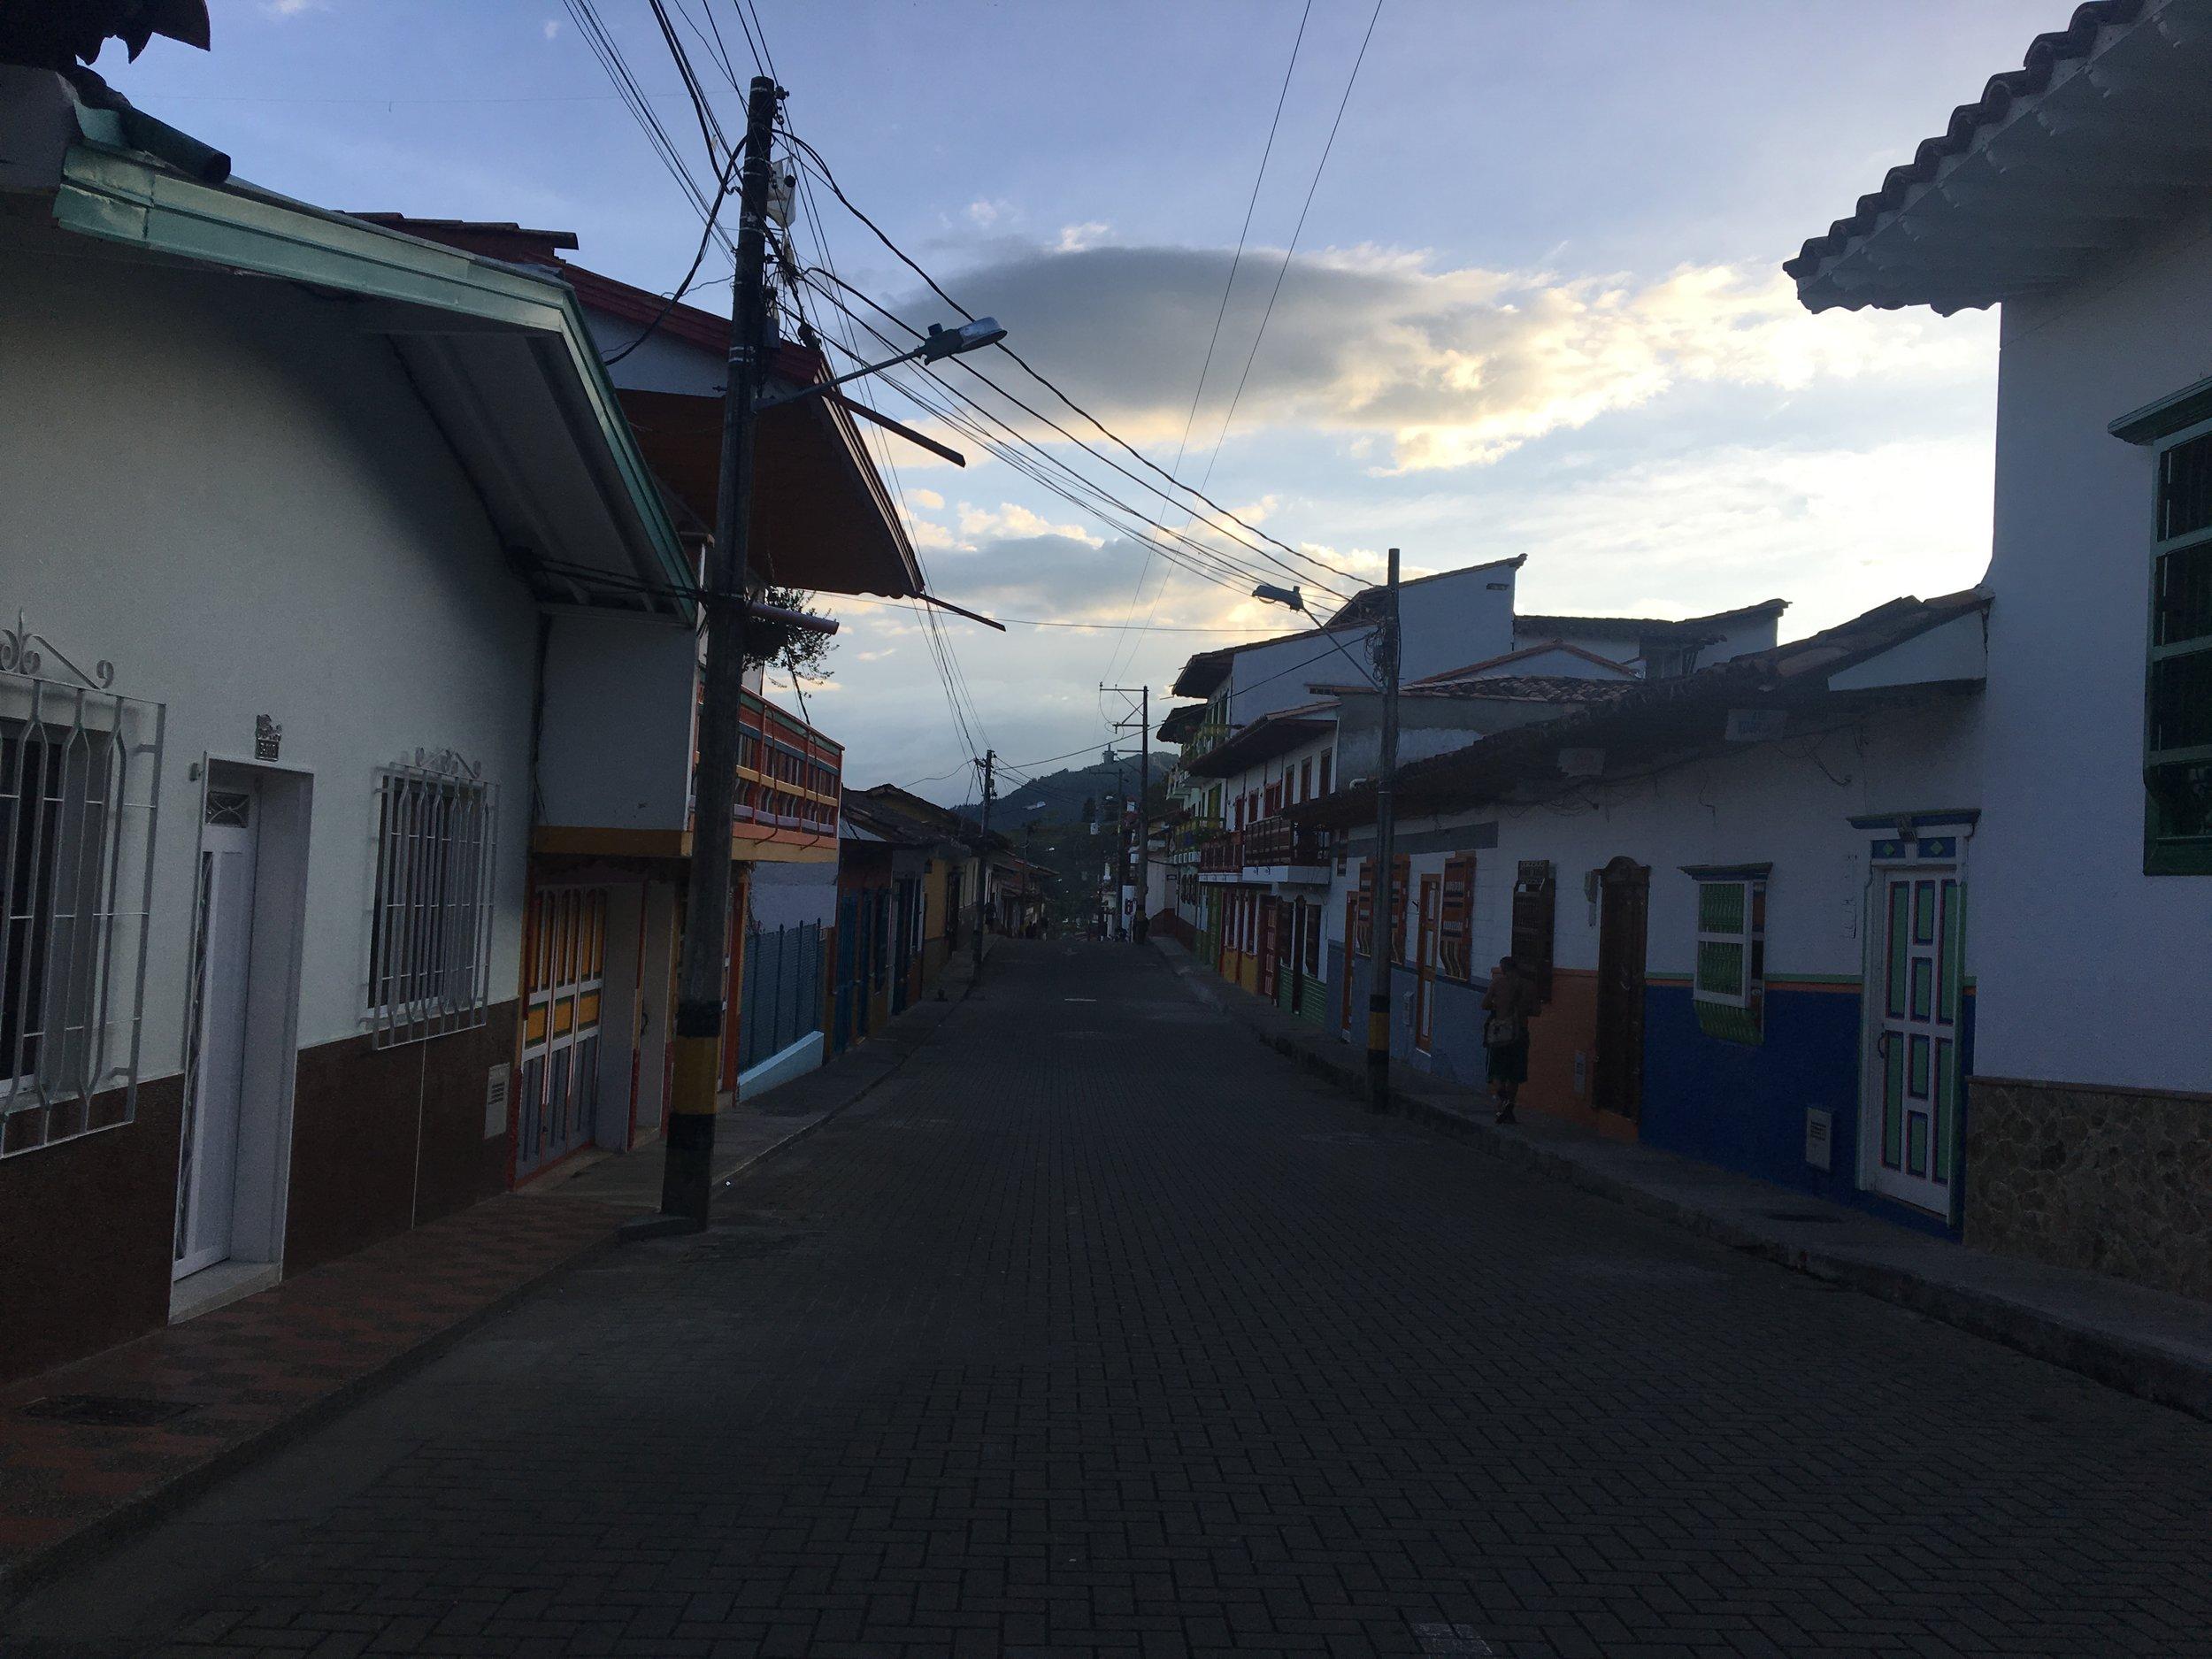 Streets of Jericó